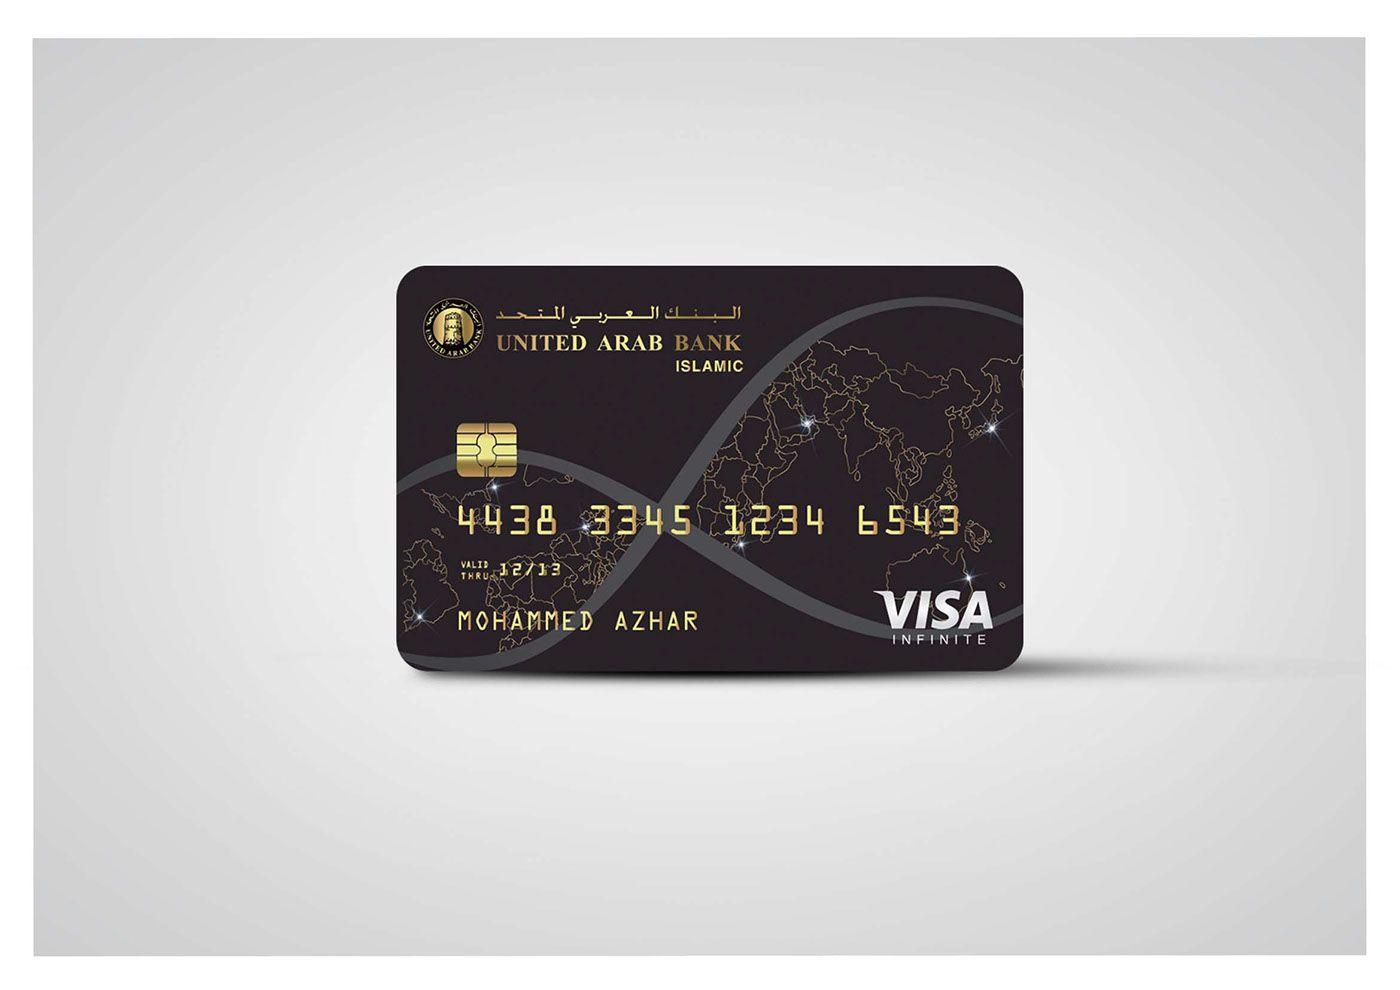 United Arab Bank Credit Card Design Debit Card Design Card Design